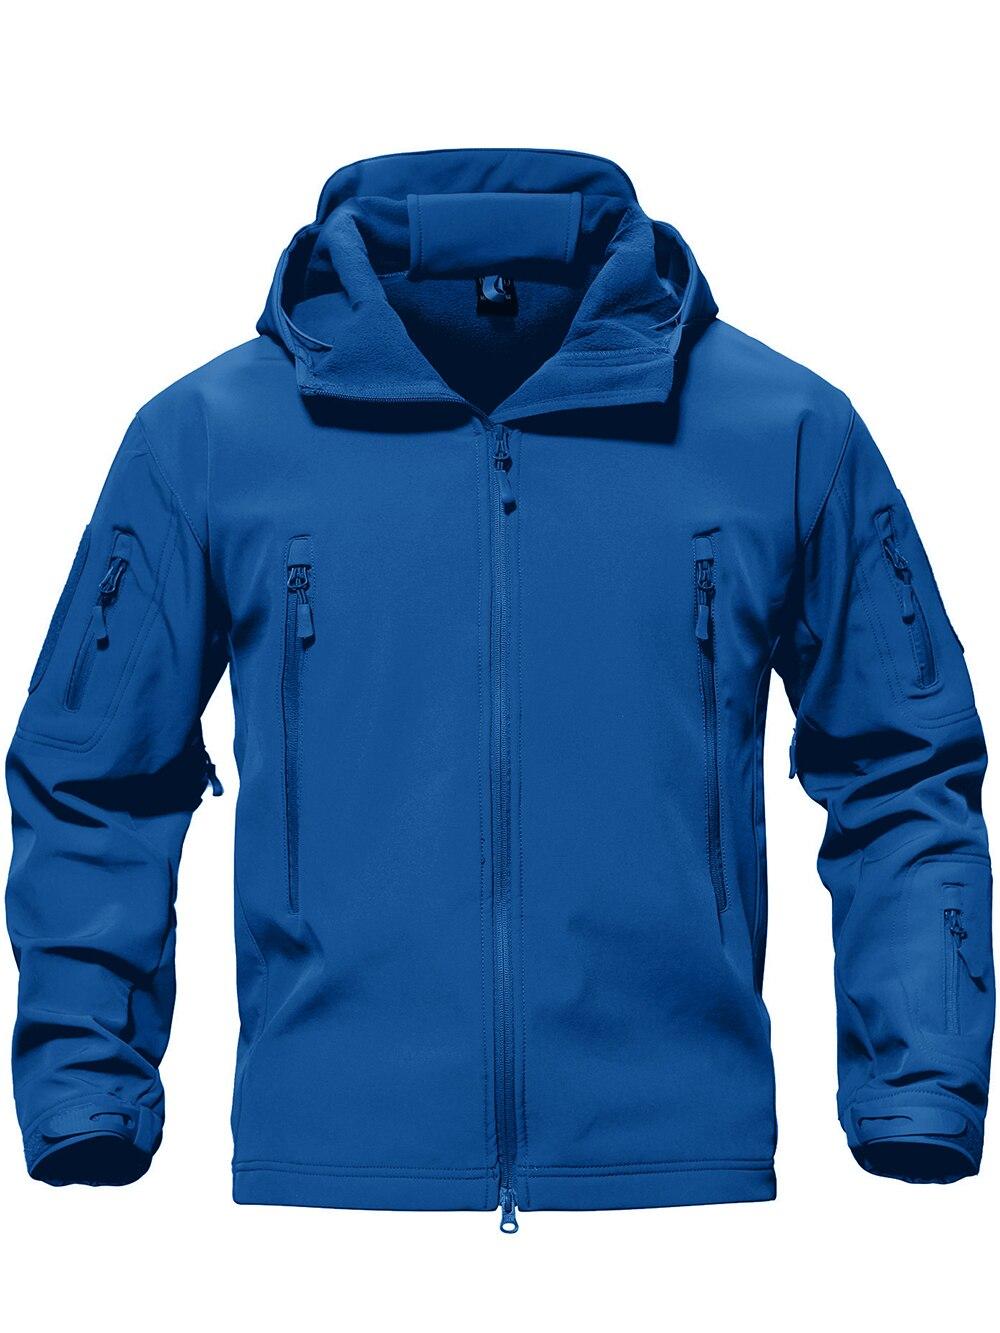 TACVASEN Softshell Jacket Windbreaker Military Army Hunt Waterproof Winter Camouflage